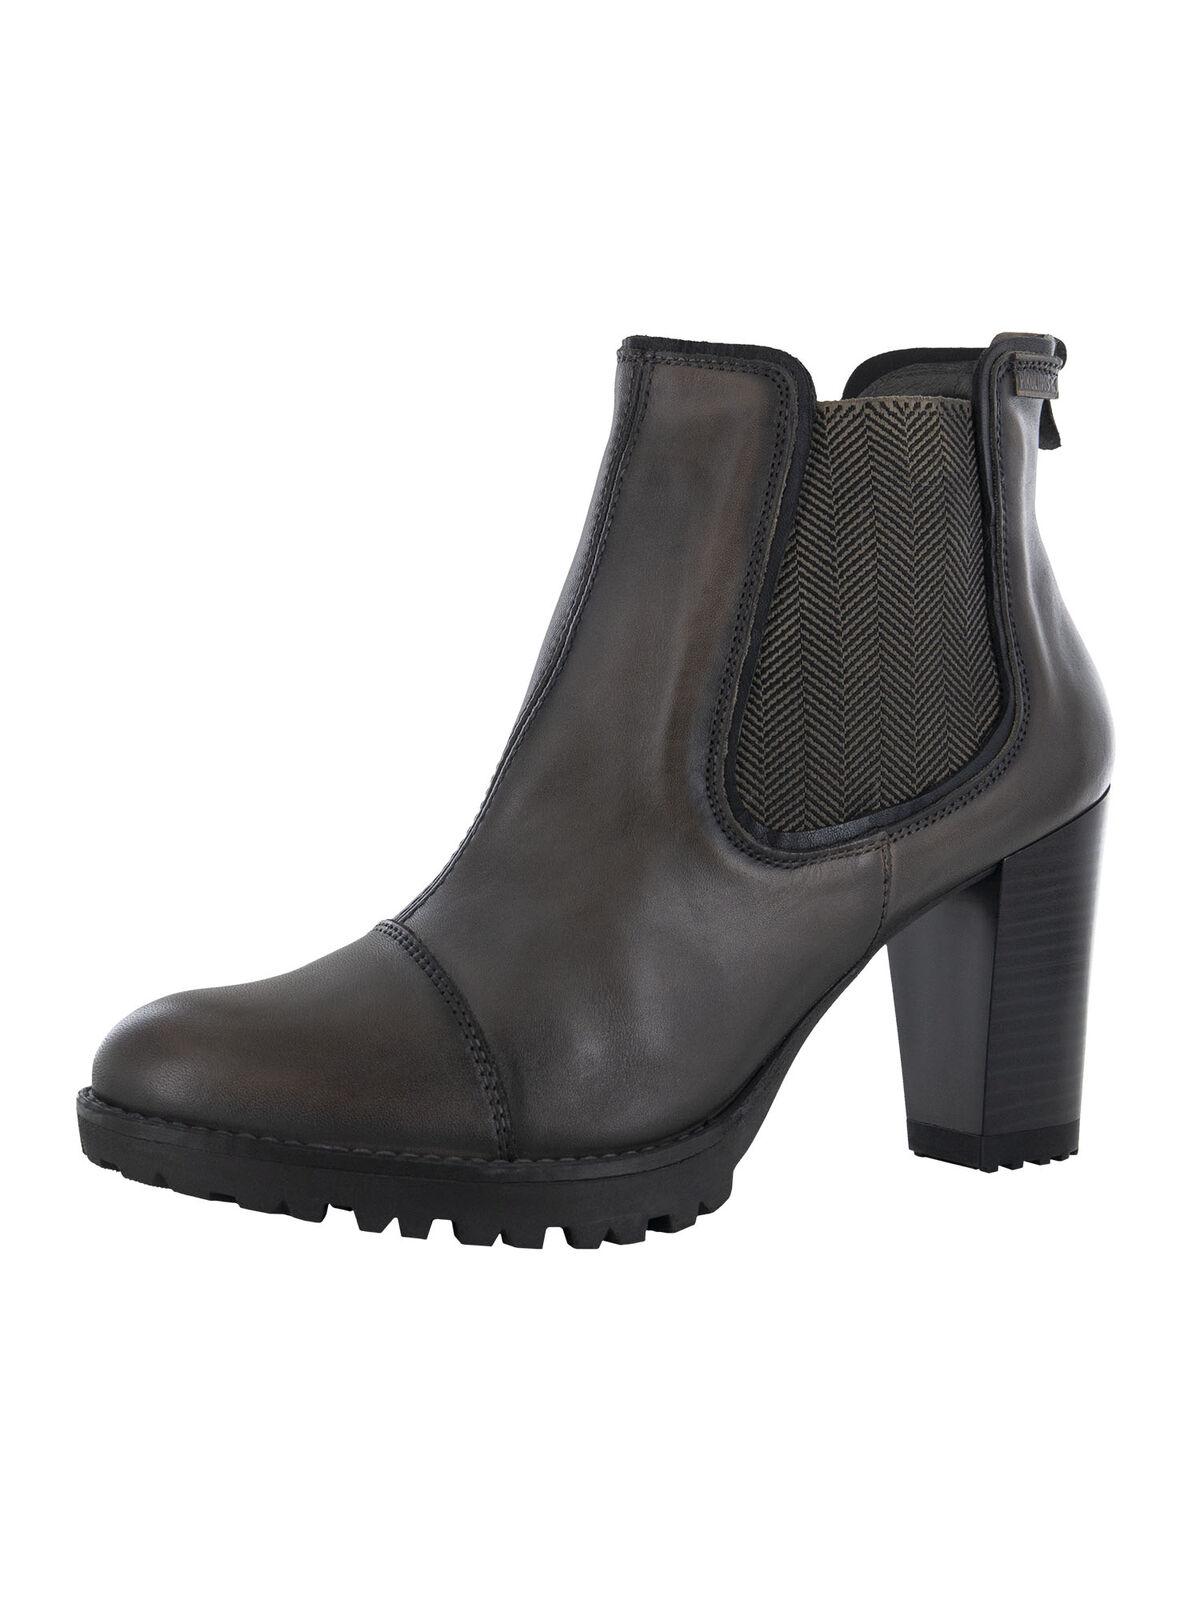 Pikolinos Womens Connelly W3E-8709 Boot Shoes, Siena/Black, 42 EU / 11.5-12 US